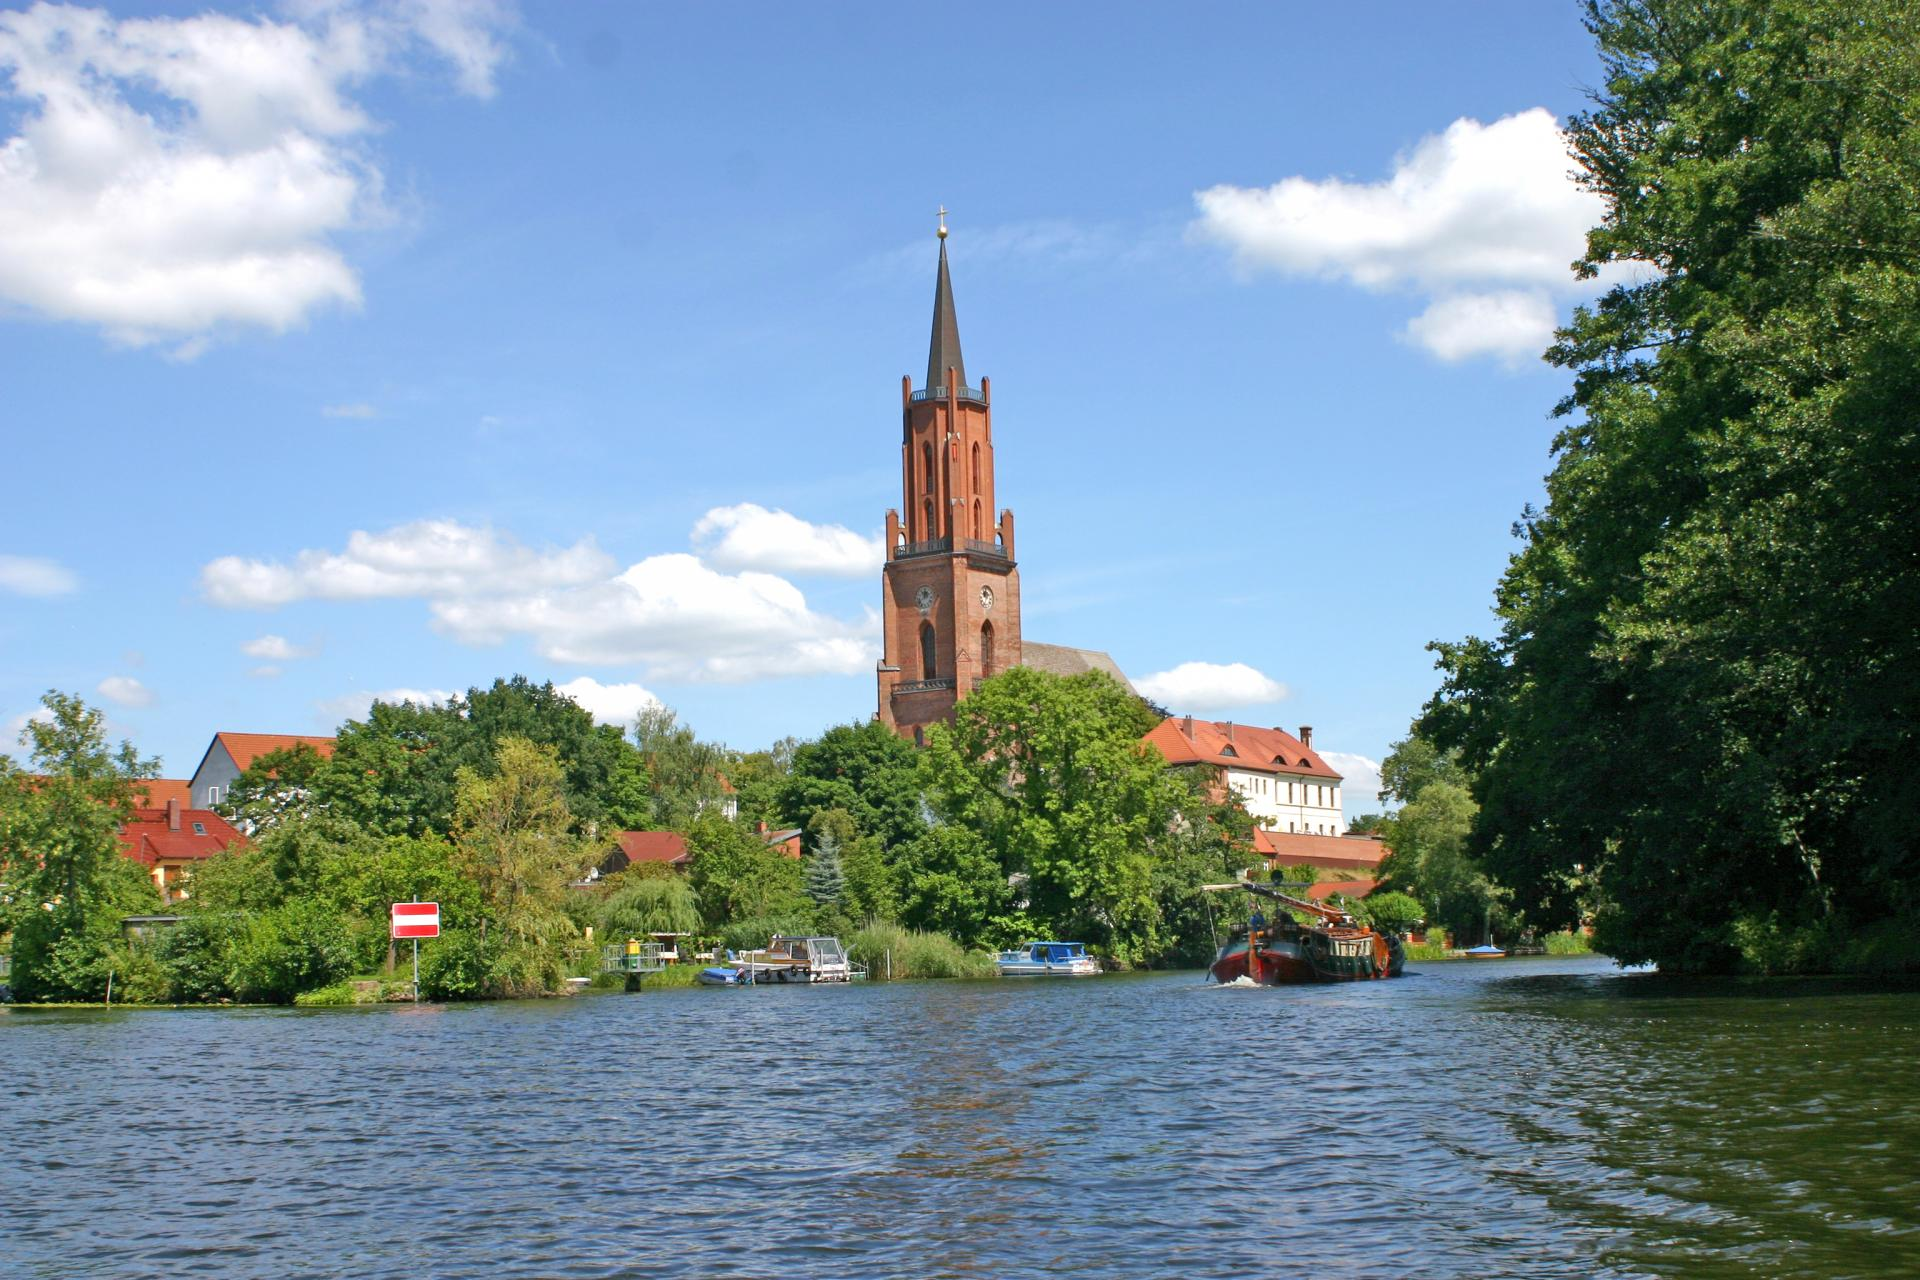 Rathenow Kirche